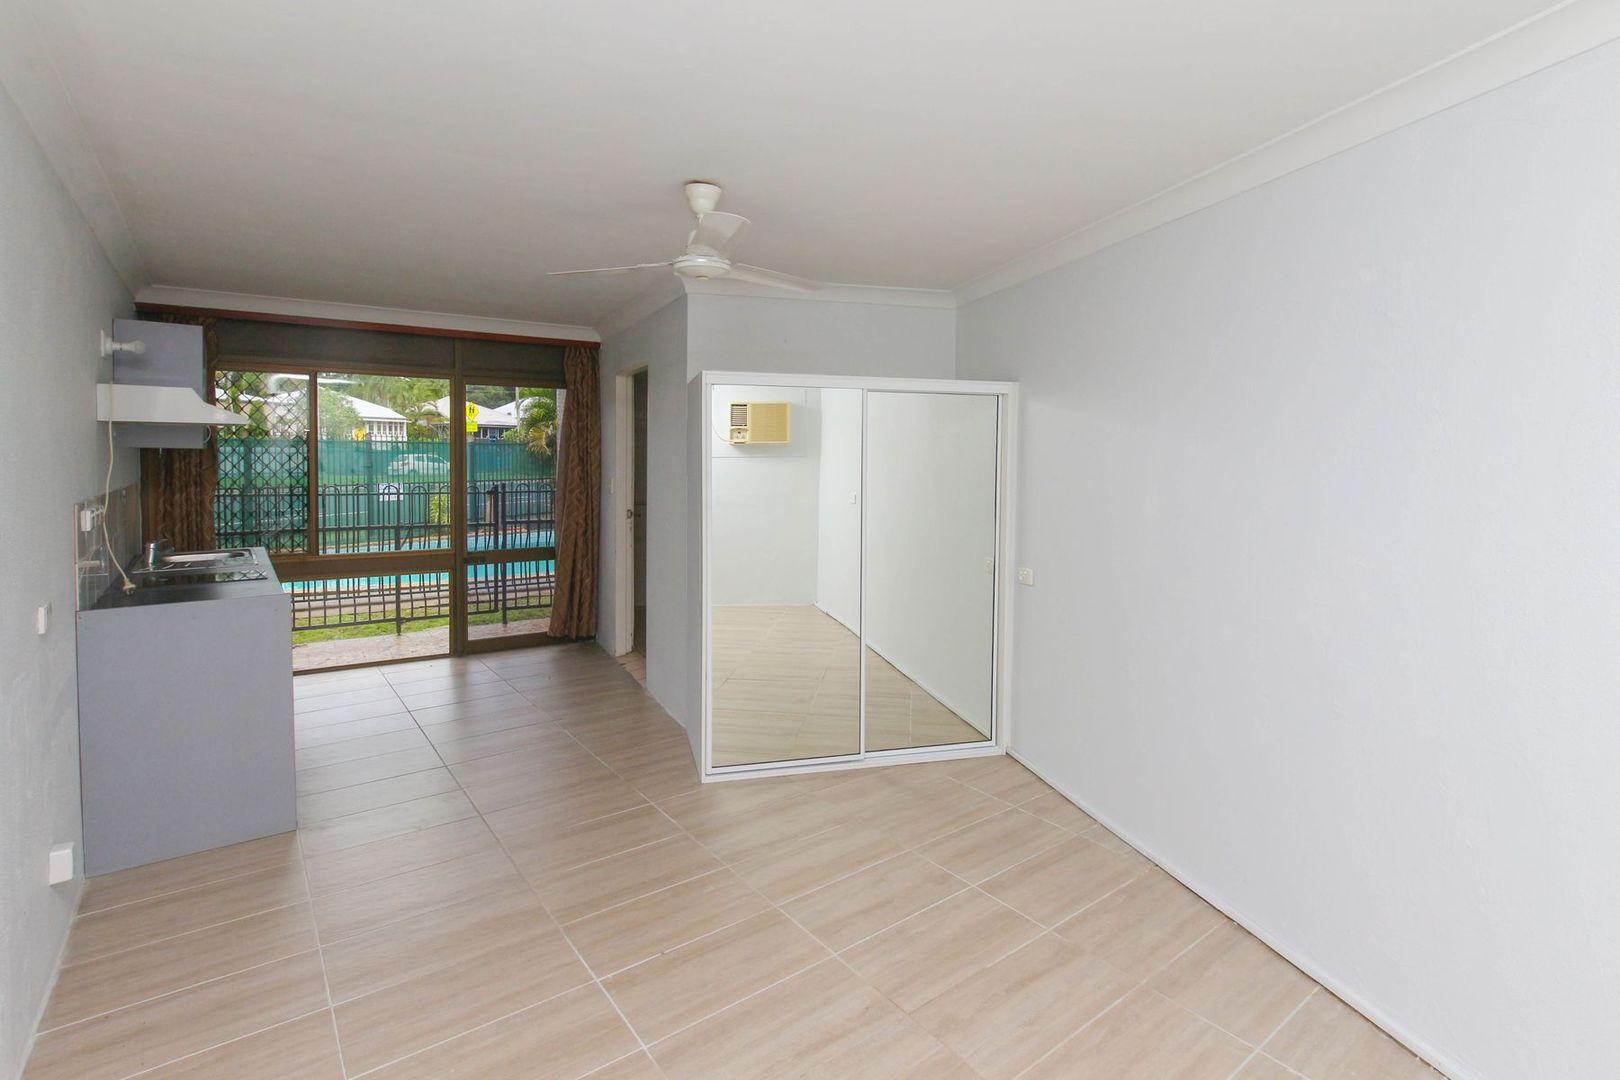 12/261-265 Sheridan Street, Cairns North QLD 4870, Image 0